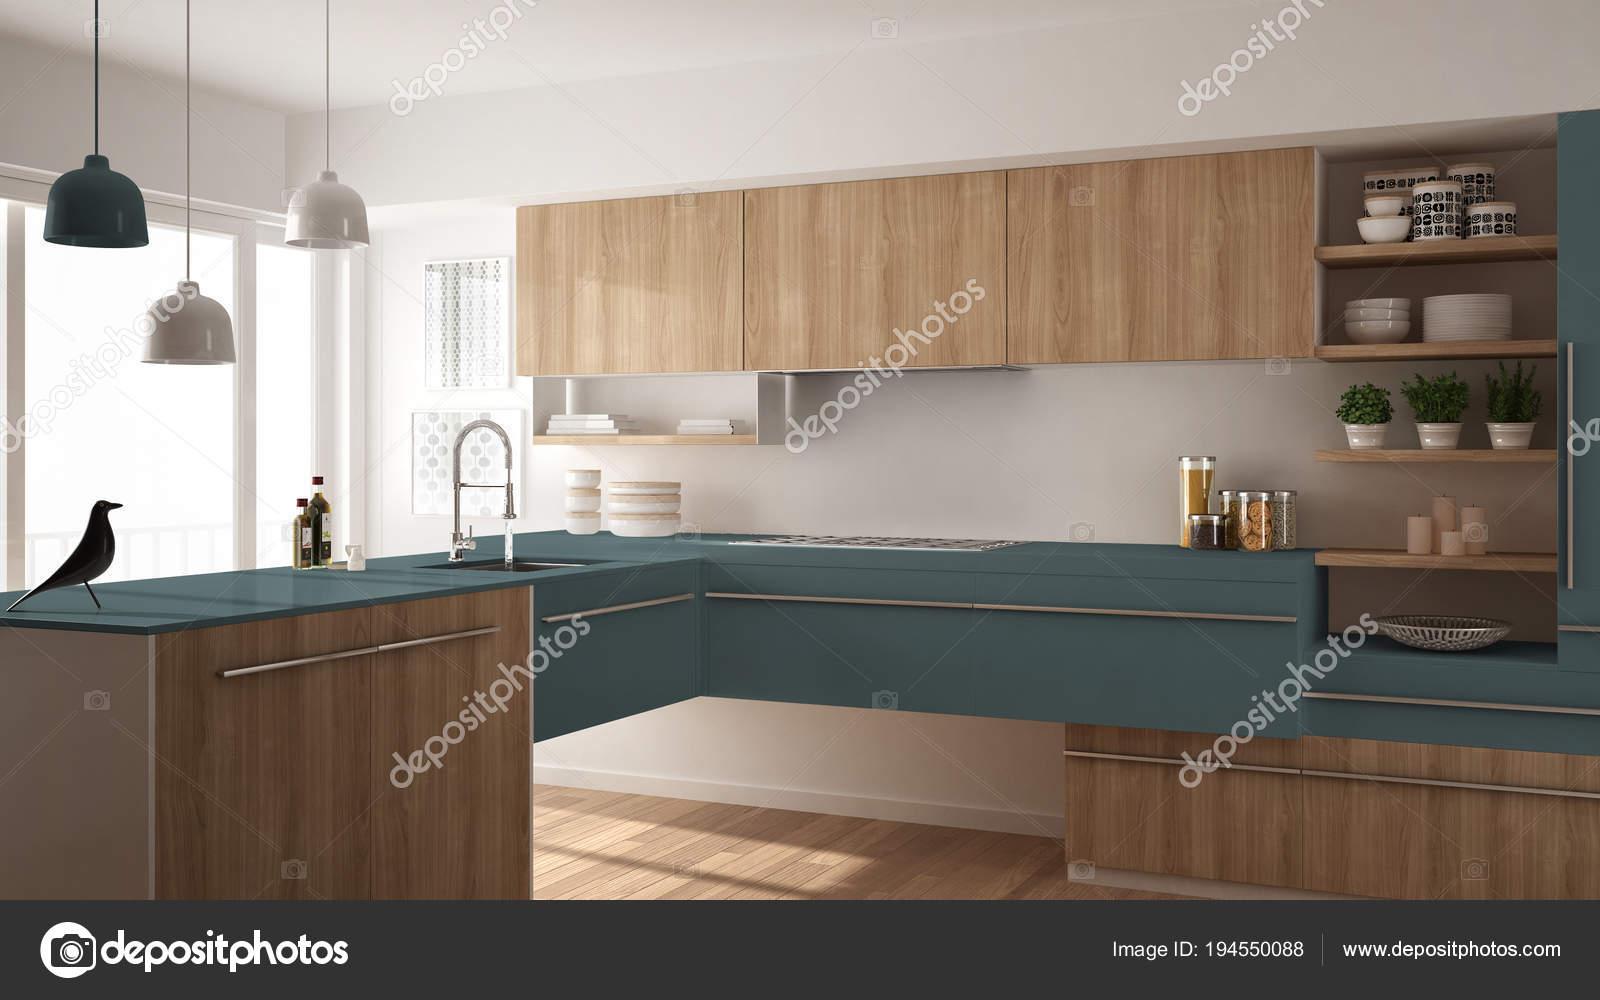 blue kitchen rugs furniture sets 现代简约木制厨房与镶木地板 地毯和全景窗口 白色和蓝色建筑学室内设计 照片作者archiviz